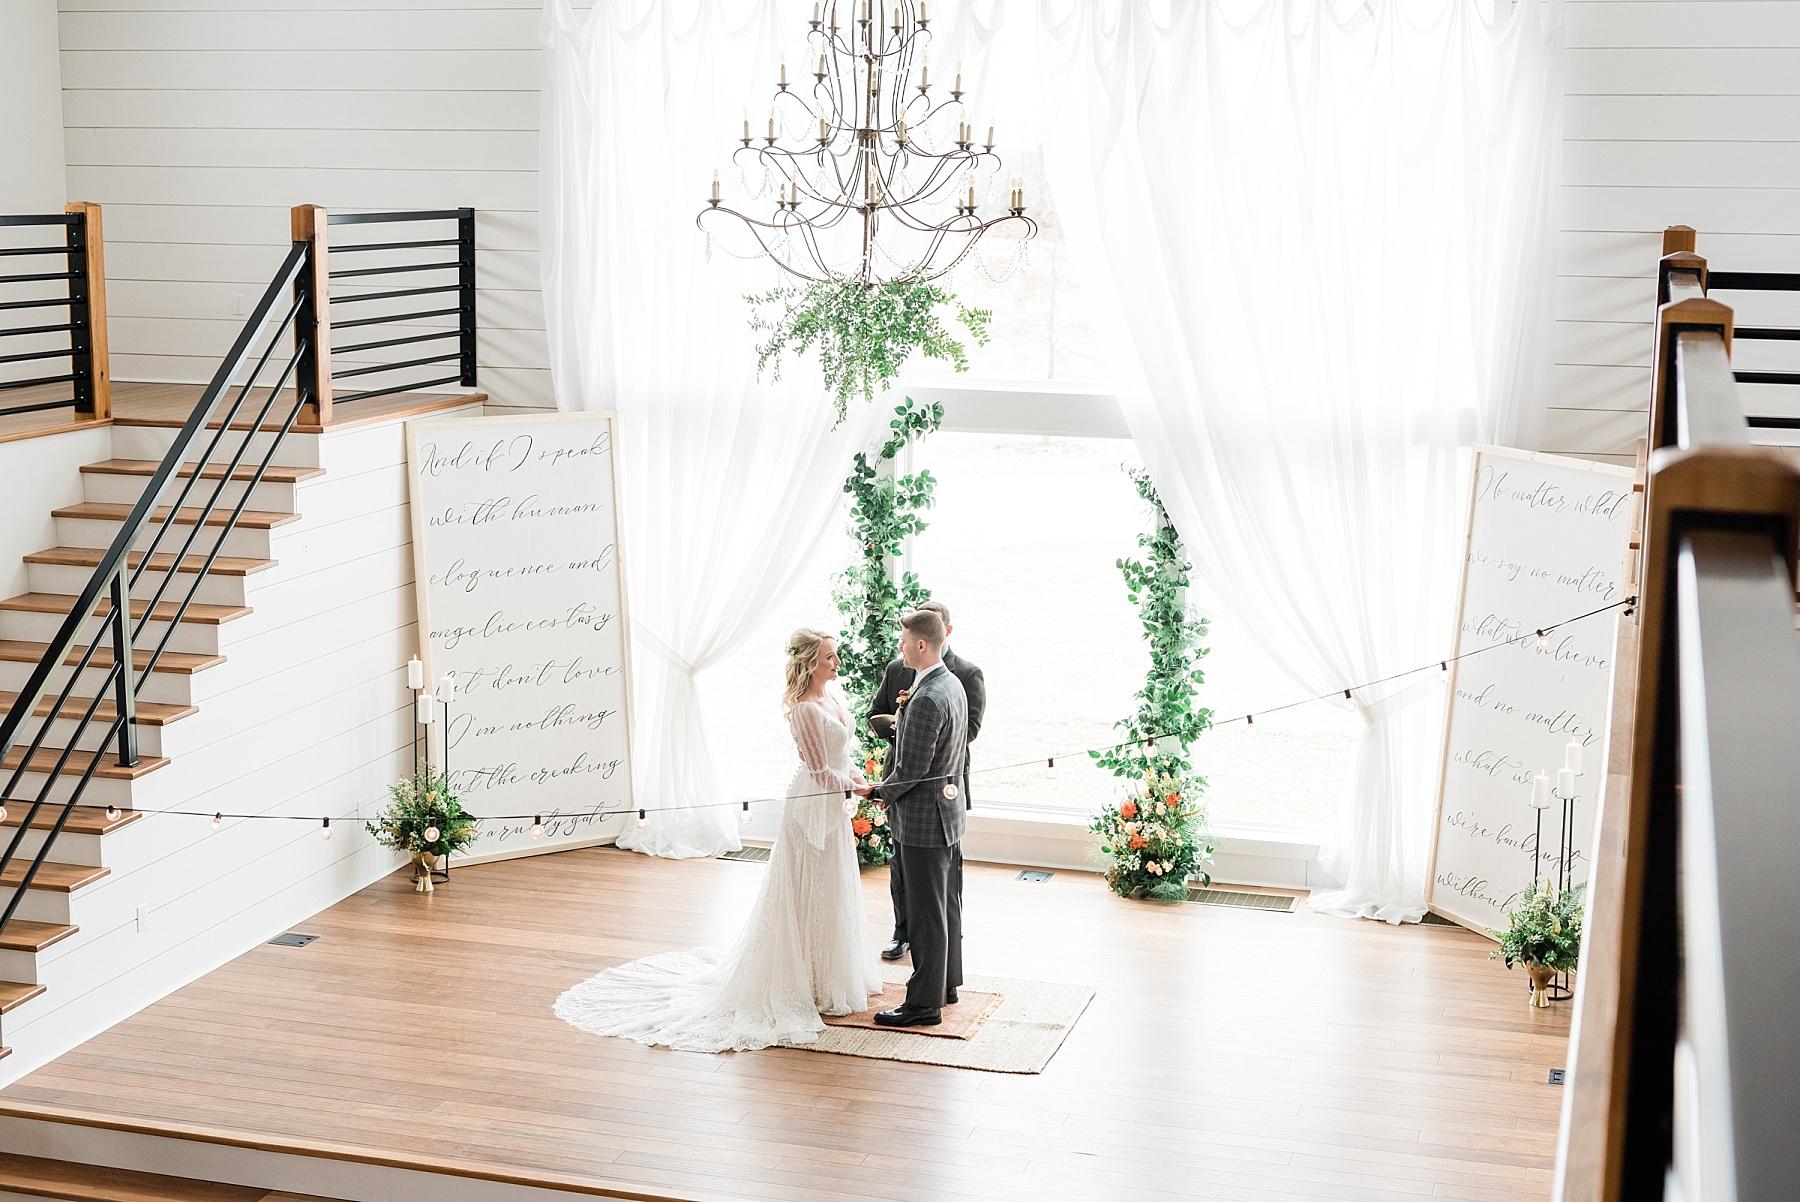 Eclectic Scandinavian Winter Wedding in All White Venue Emerson Fields by Kelsi Kliethermes Photography Best Missouri and Maui Wedding Photographer_0034.jpg